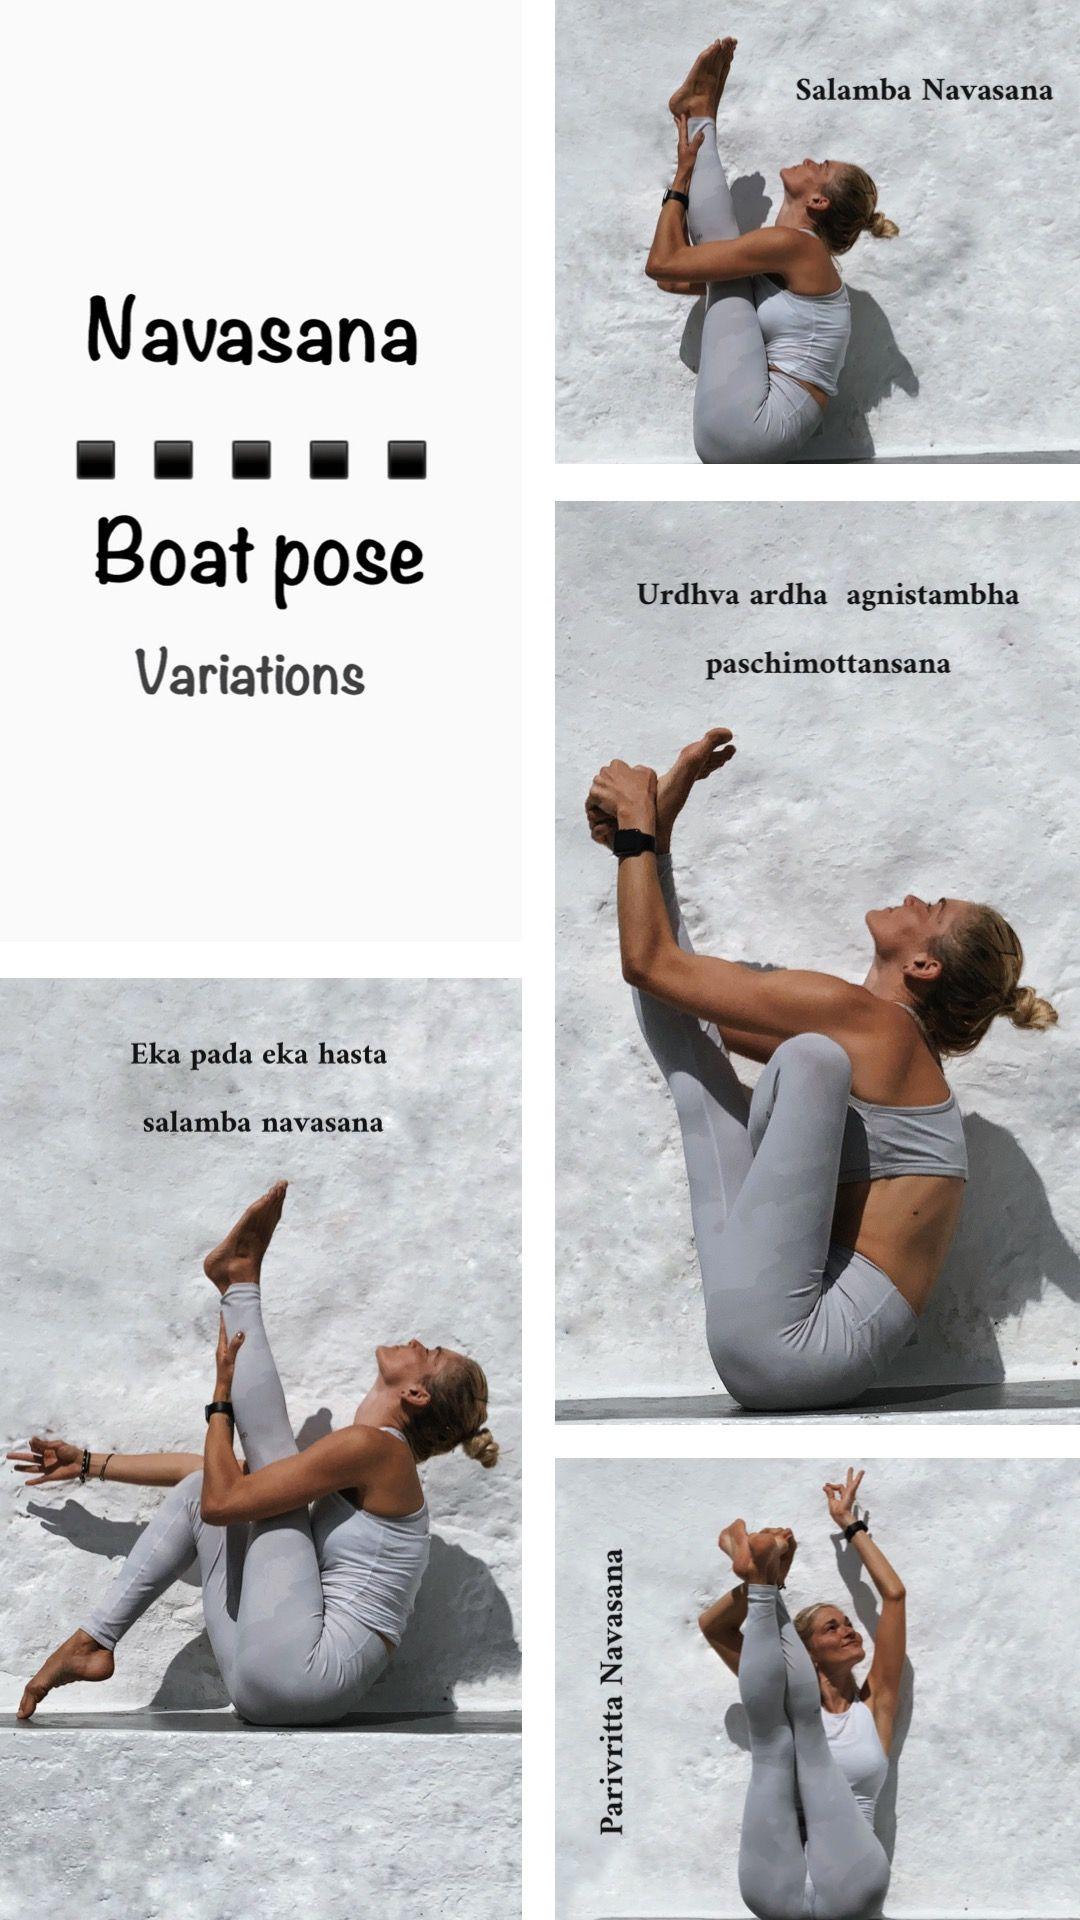 Navasana boat pose variations   Boat pose, Yoga sequences, Poses